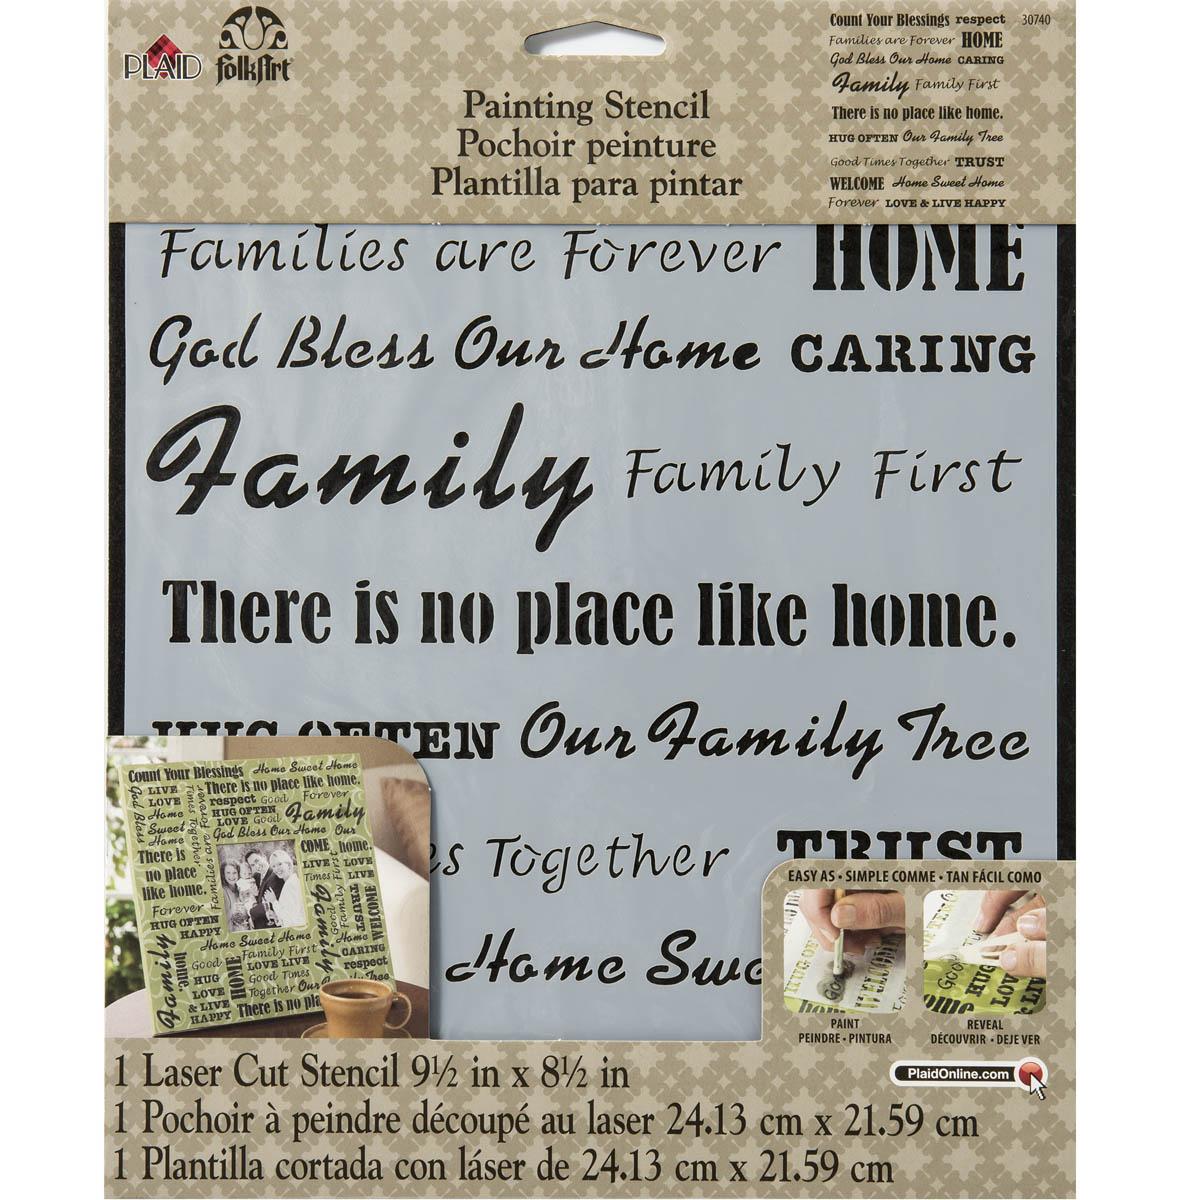 FolkArt ® Painting Stencils - Laser - Words/Phrases - Family - 30740